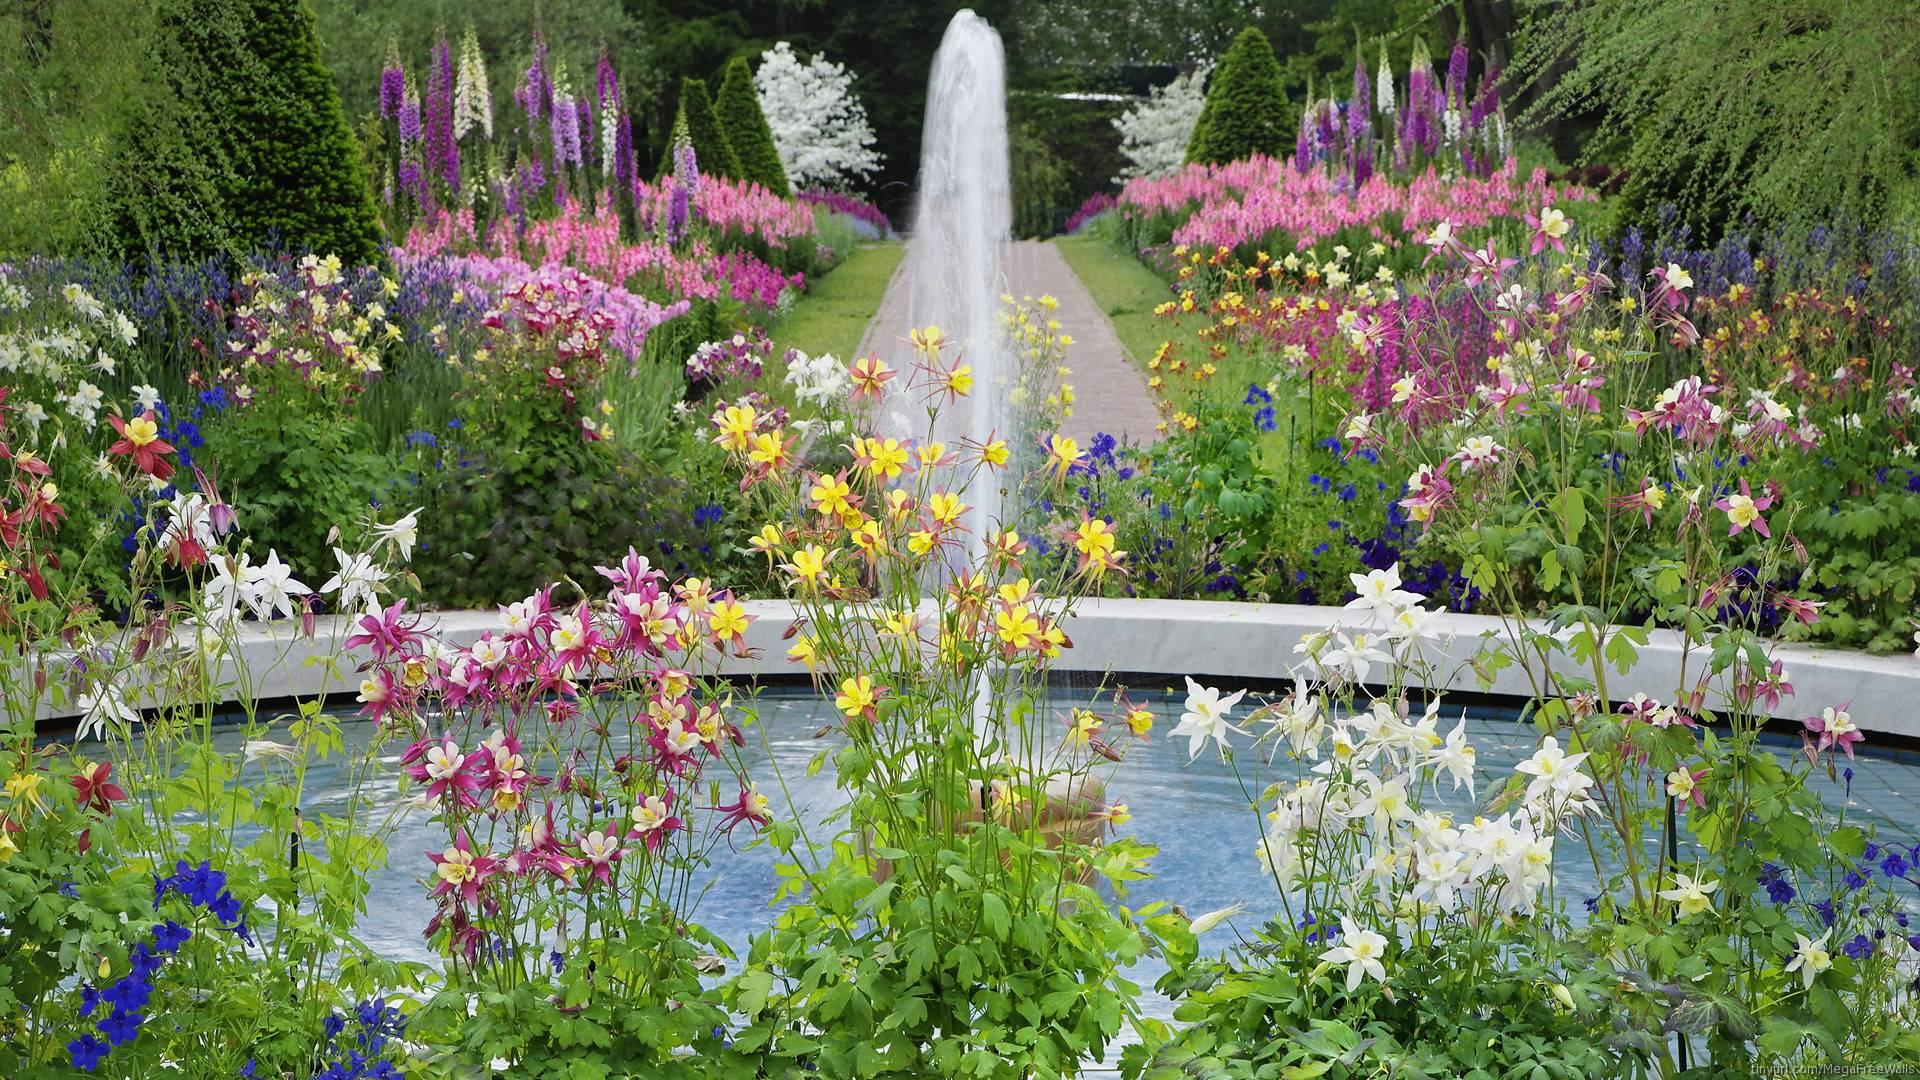 Flower Garden Wallpapers - Wallpaper Cave